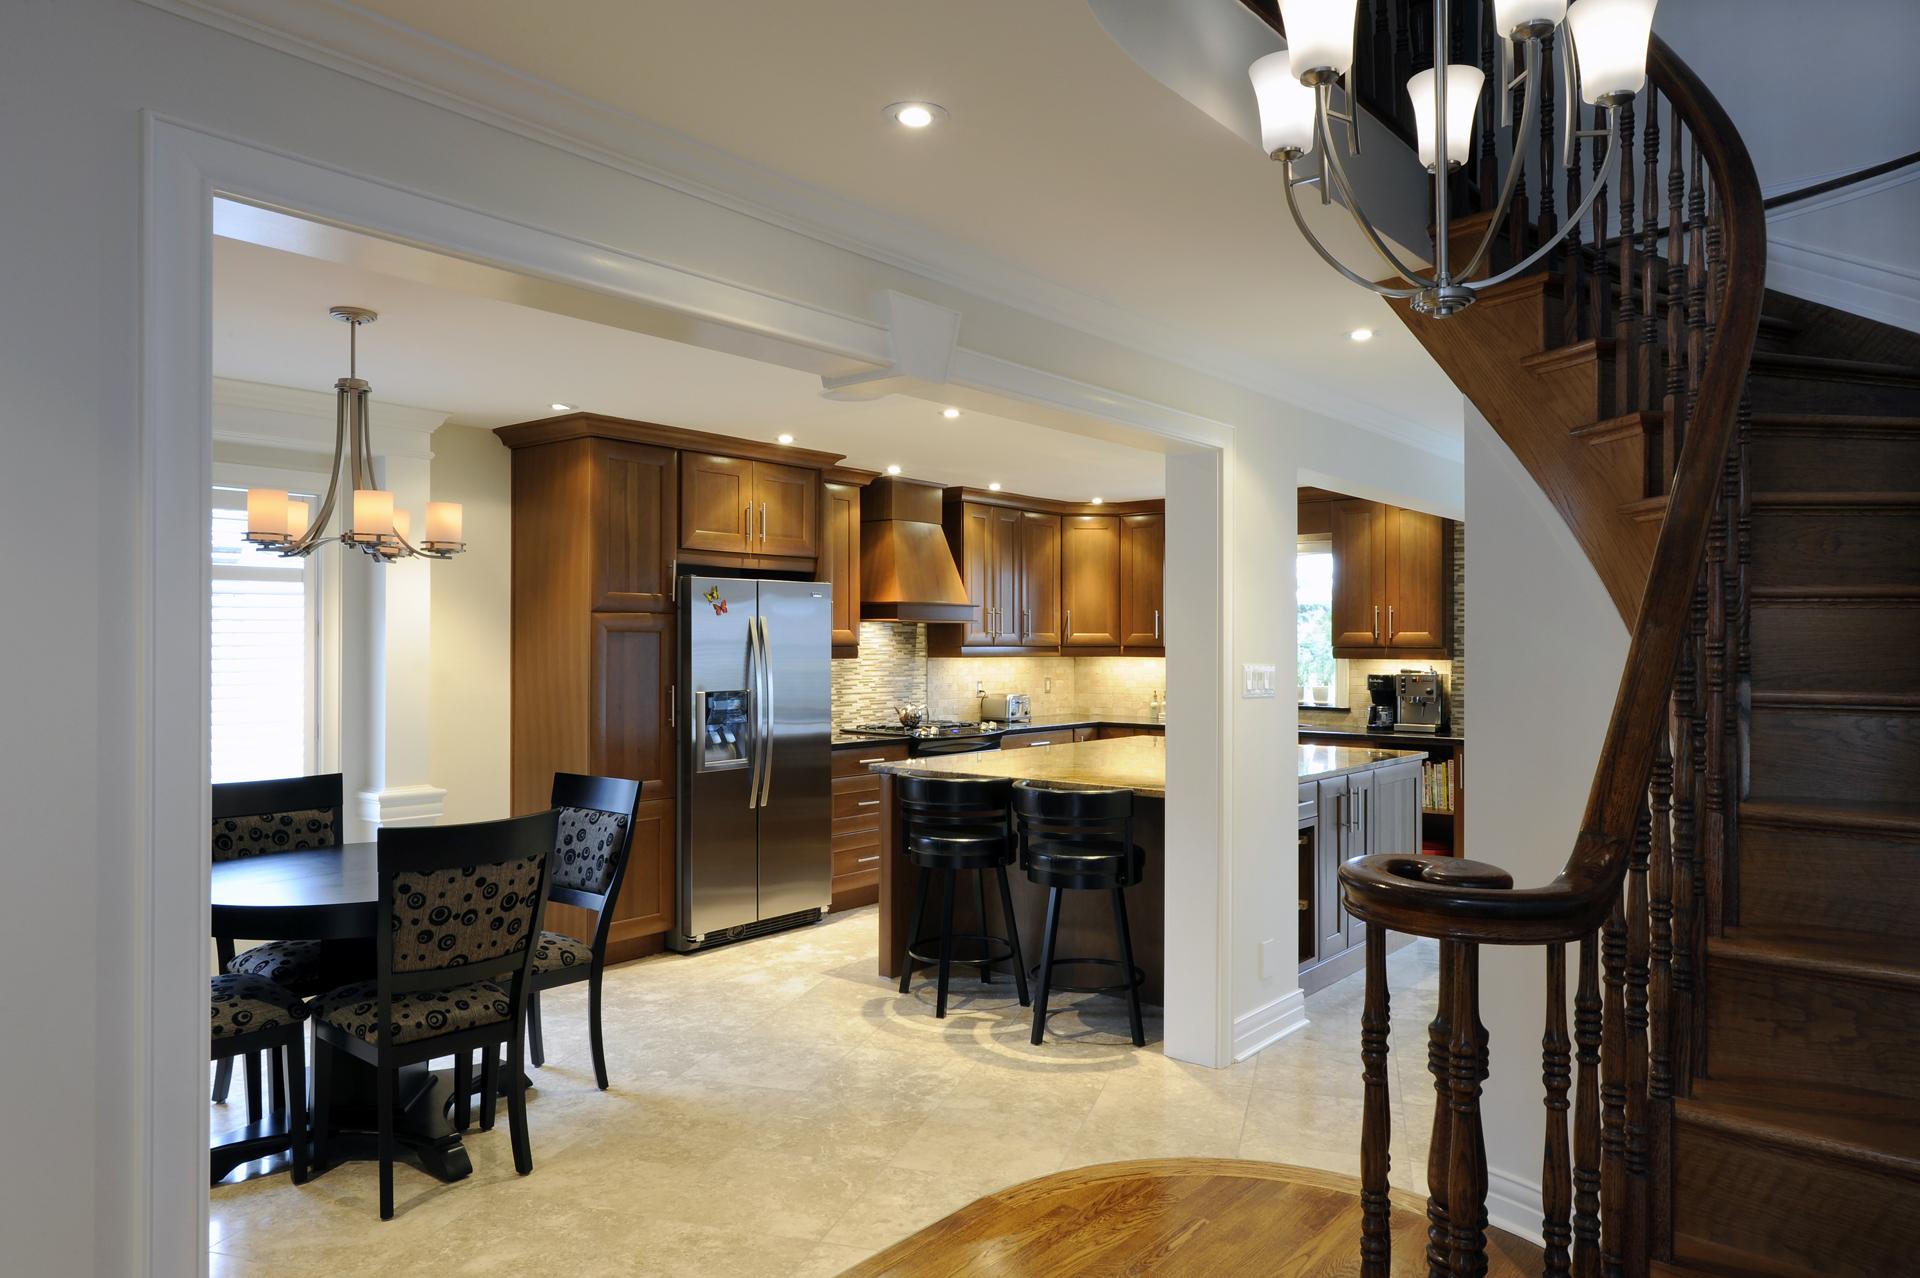 Santoro kitchen 1.jpg